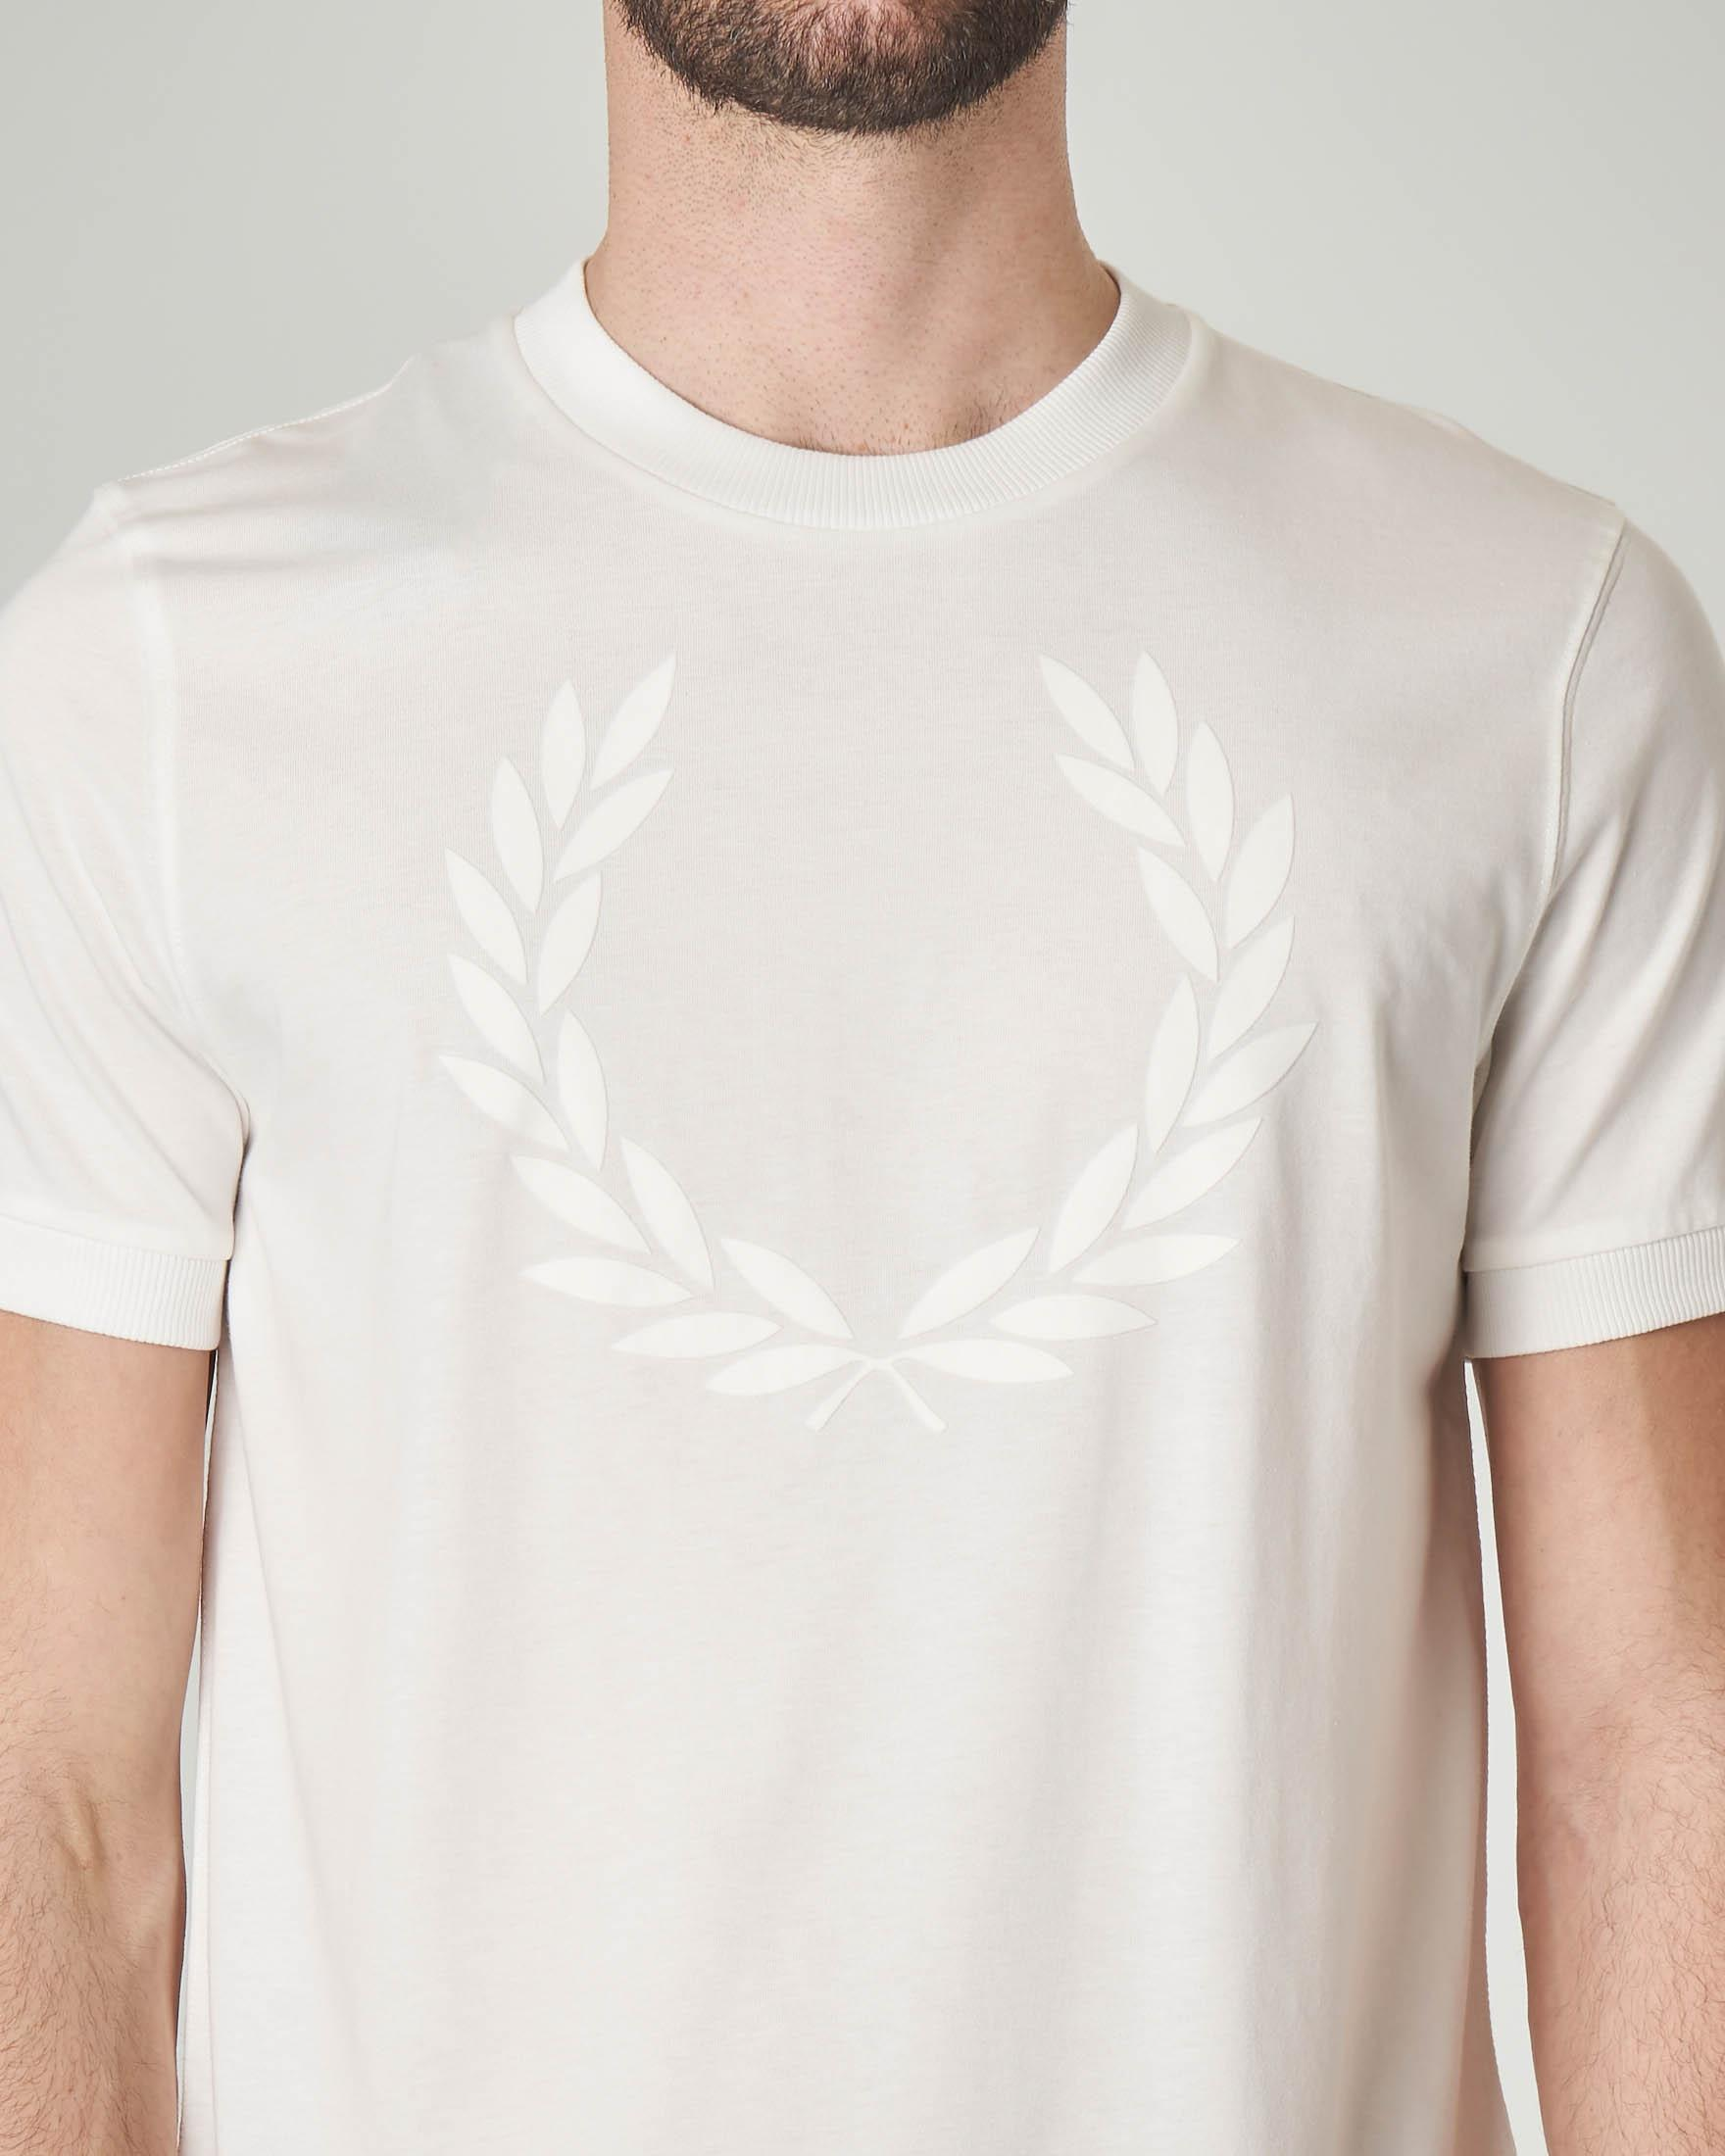 T-shirt bianca con logo in rilievo